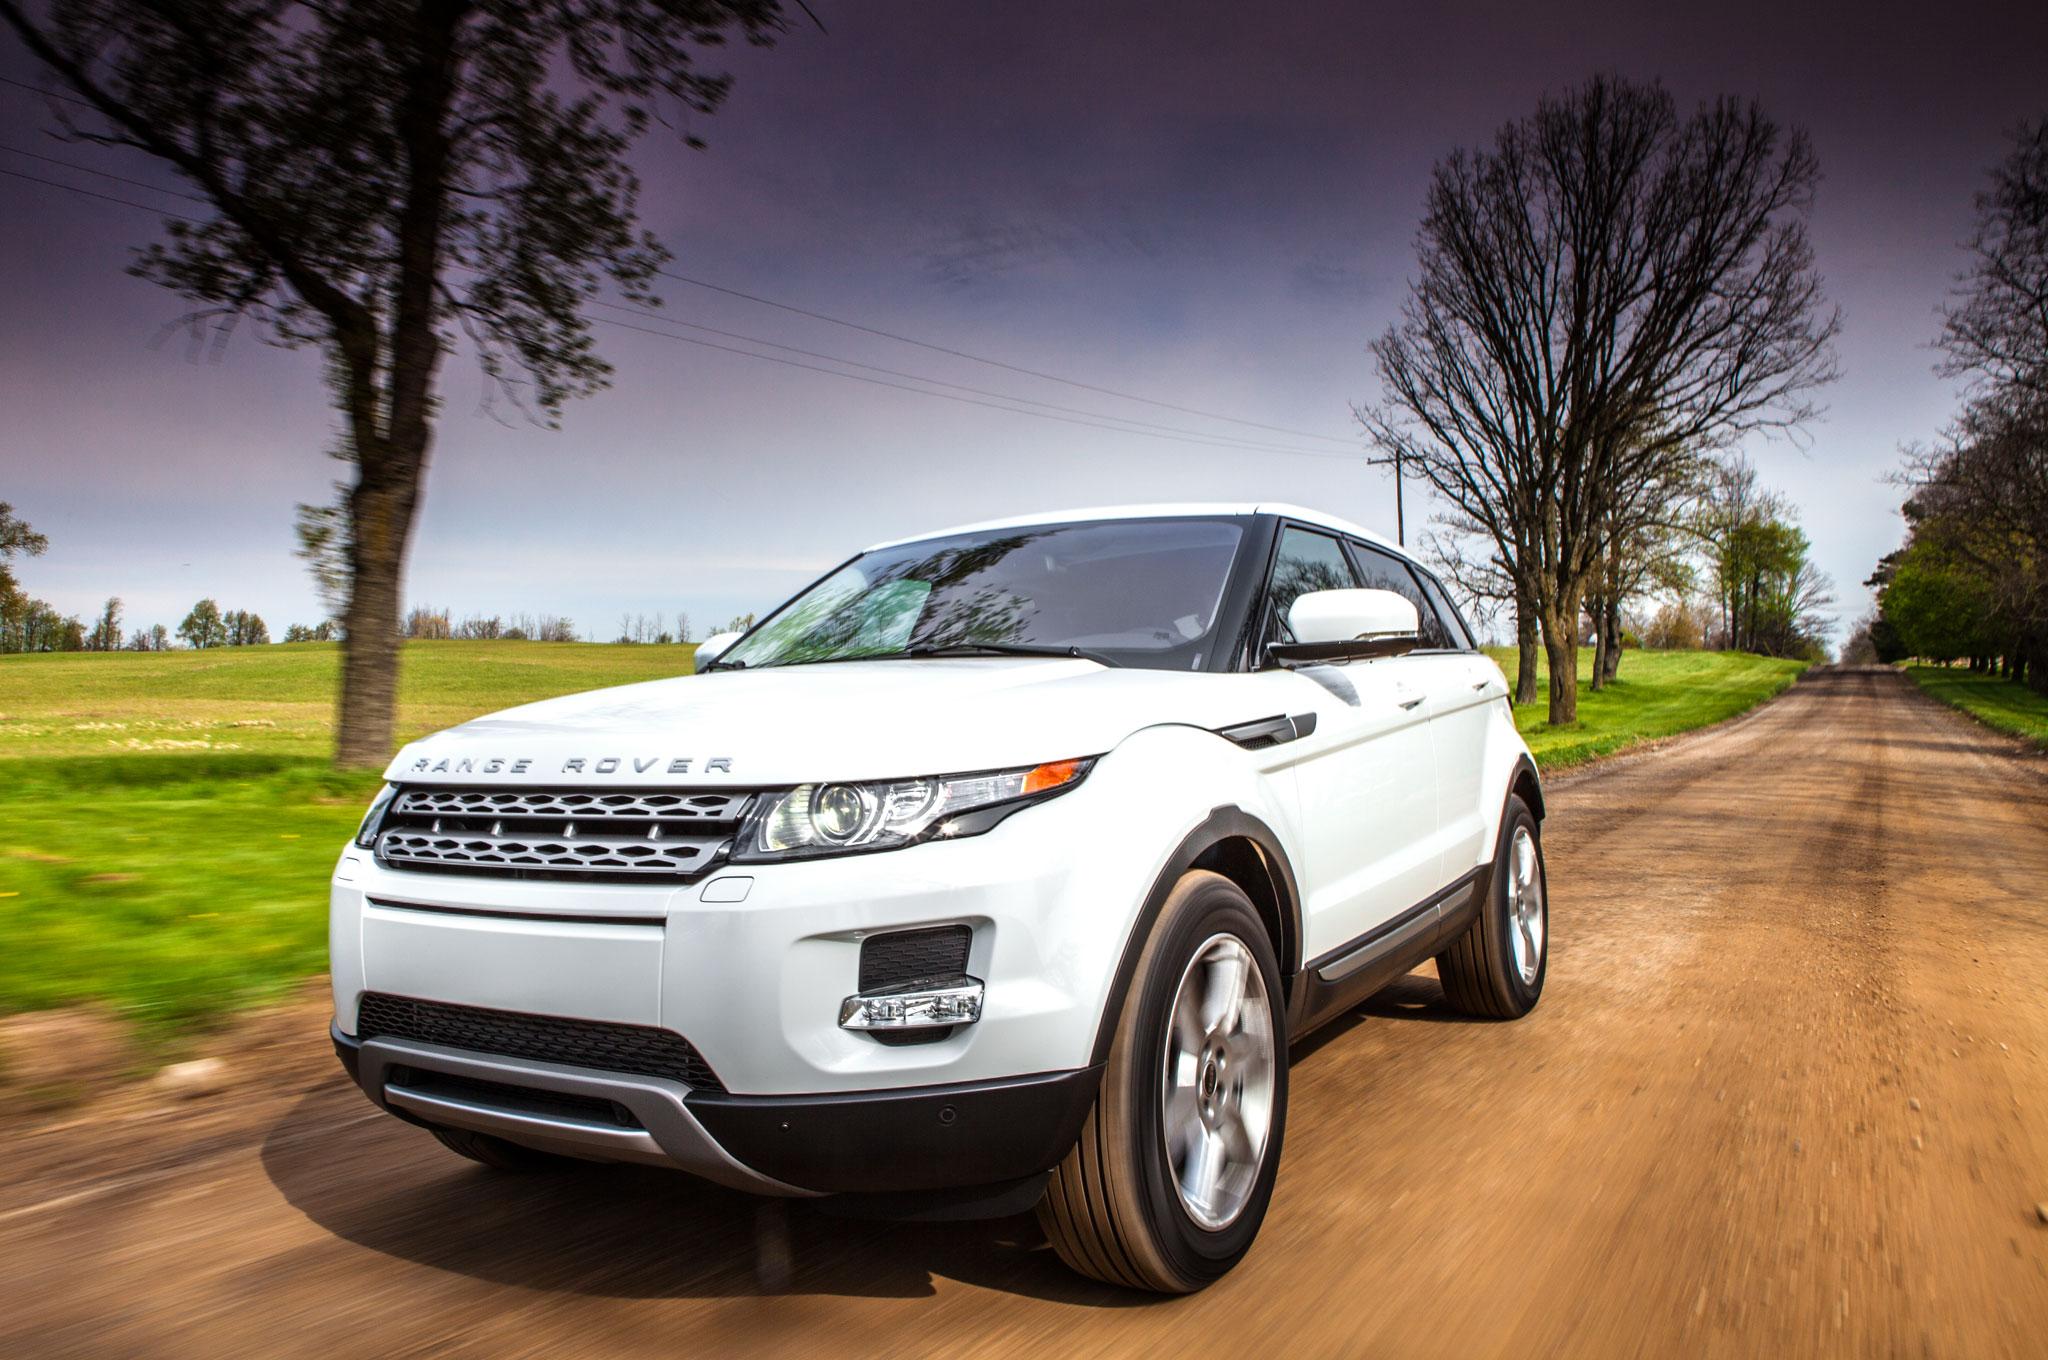 2012 Land Rover Range Rover Evoque Four Seasons Wrap Up